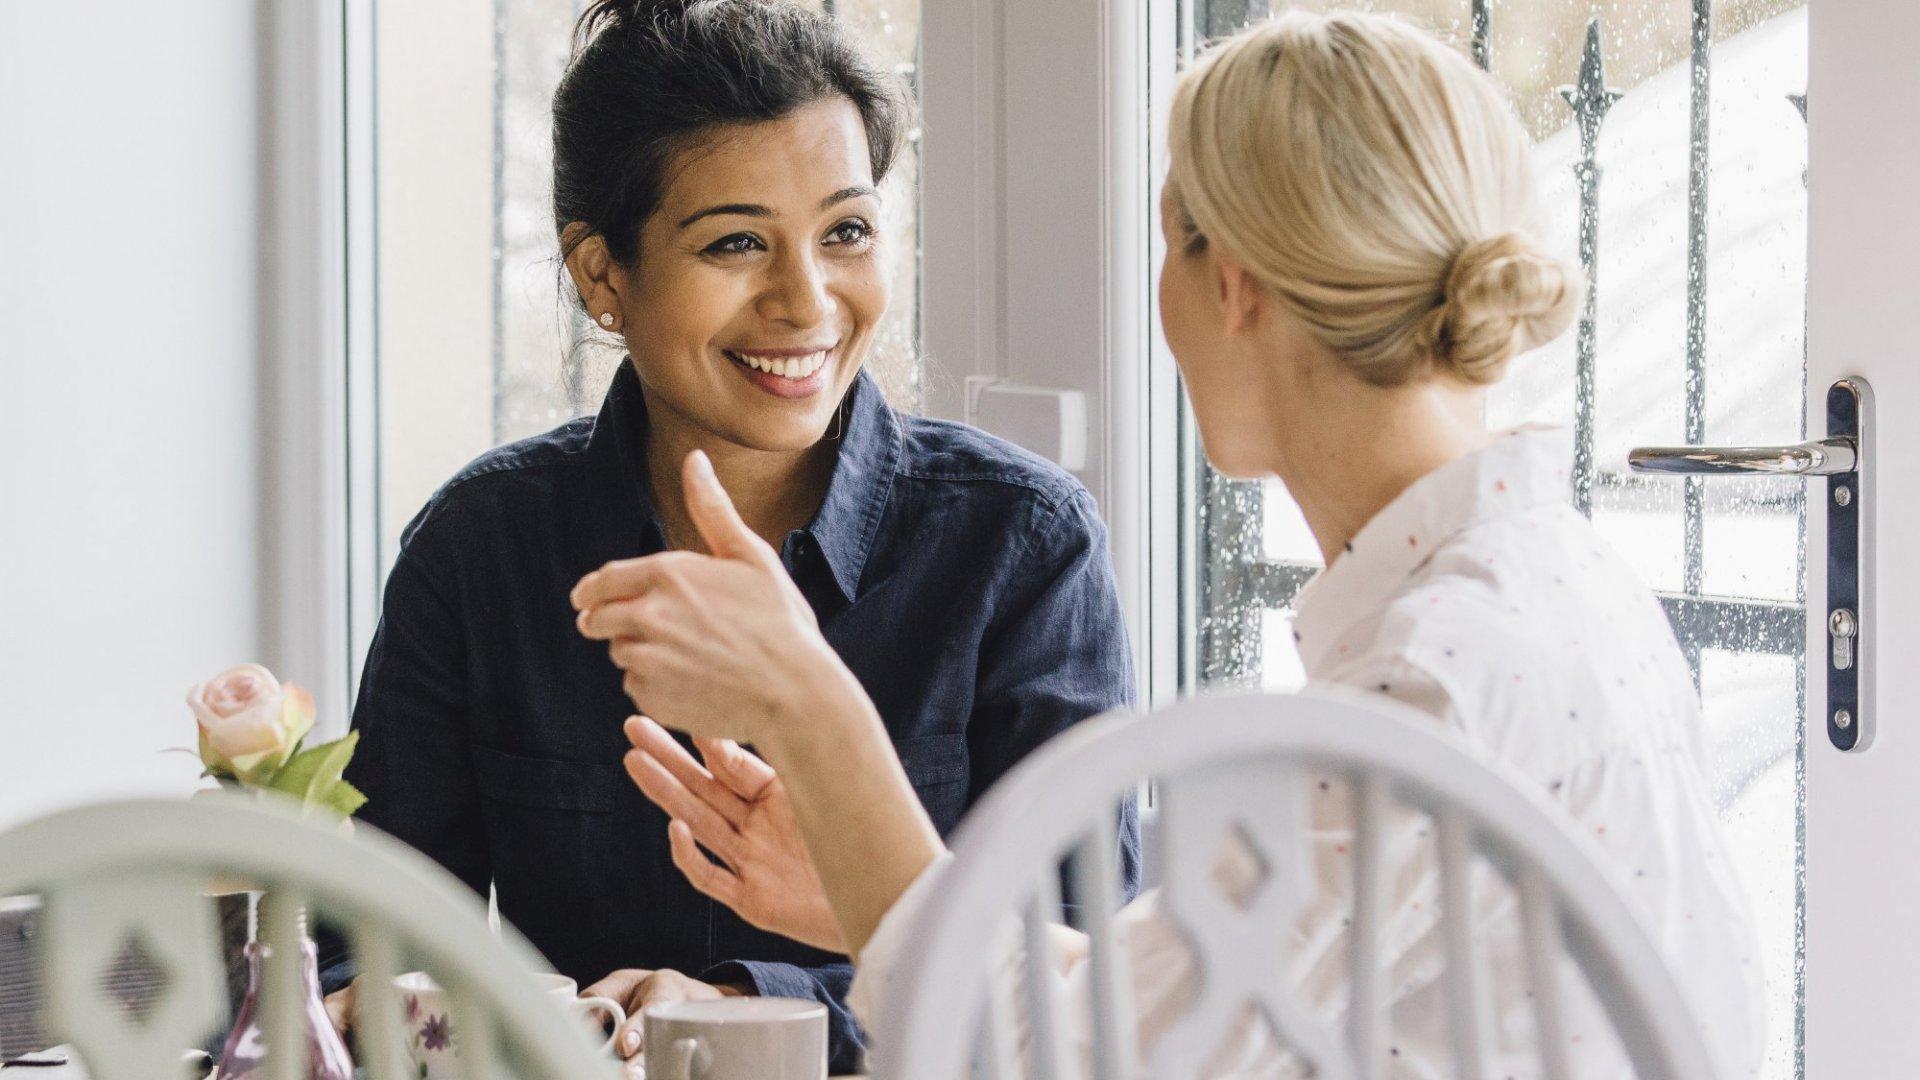 Two women deep in conversation